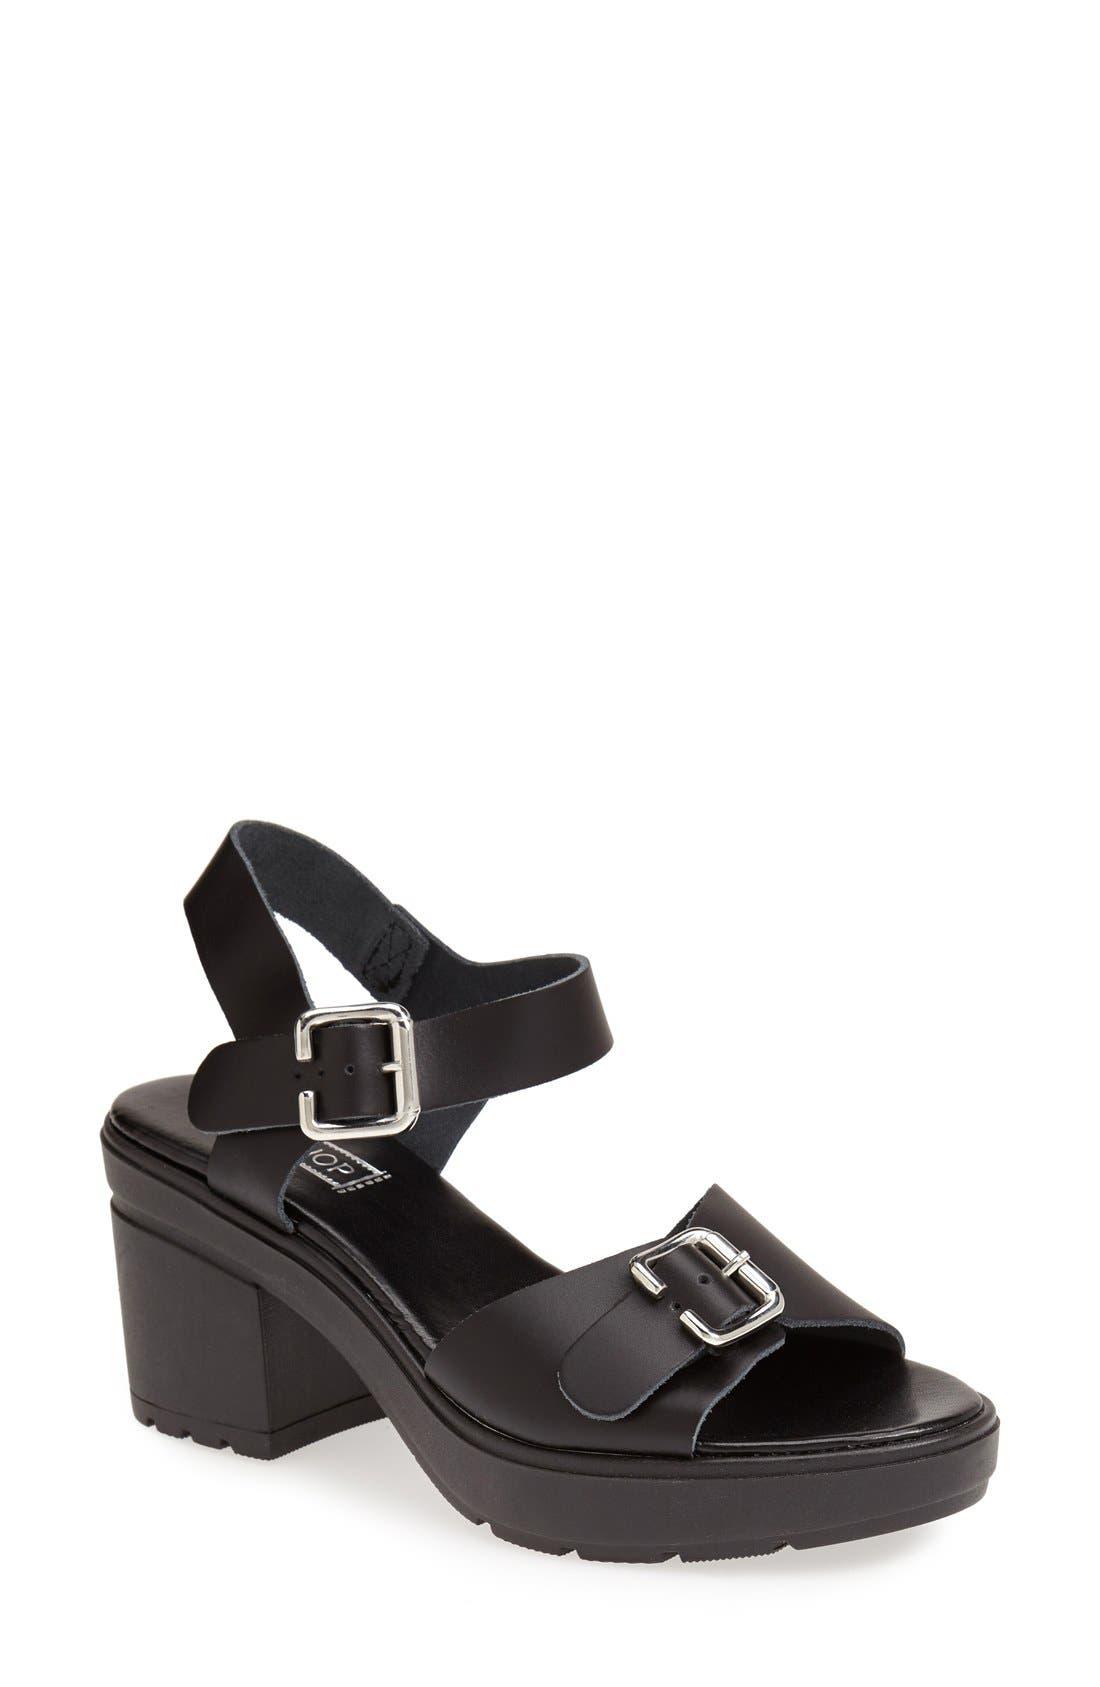 Main Image - Topshop 'Niece' Platform Leather Sandal (Women)